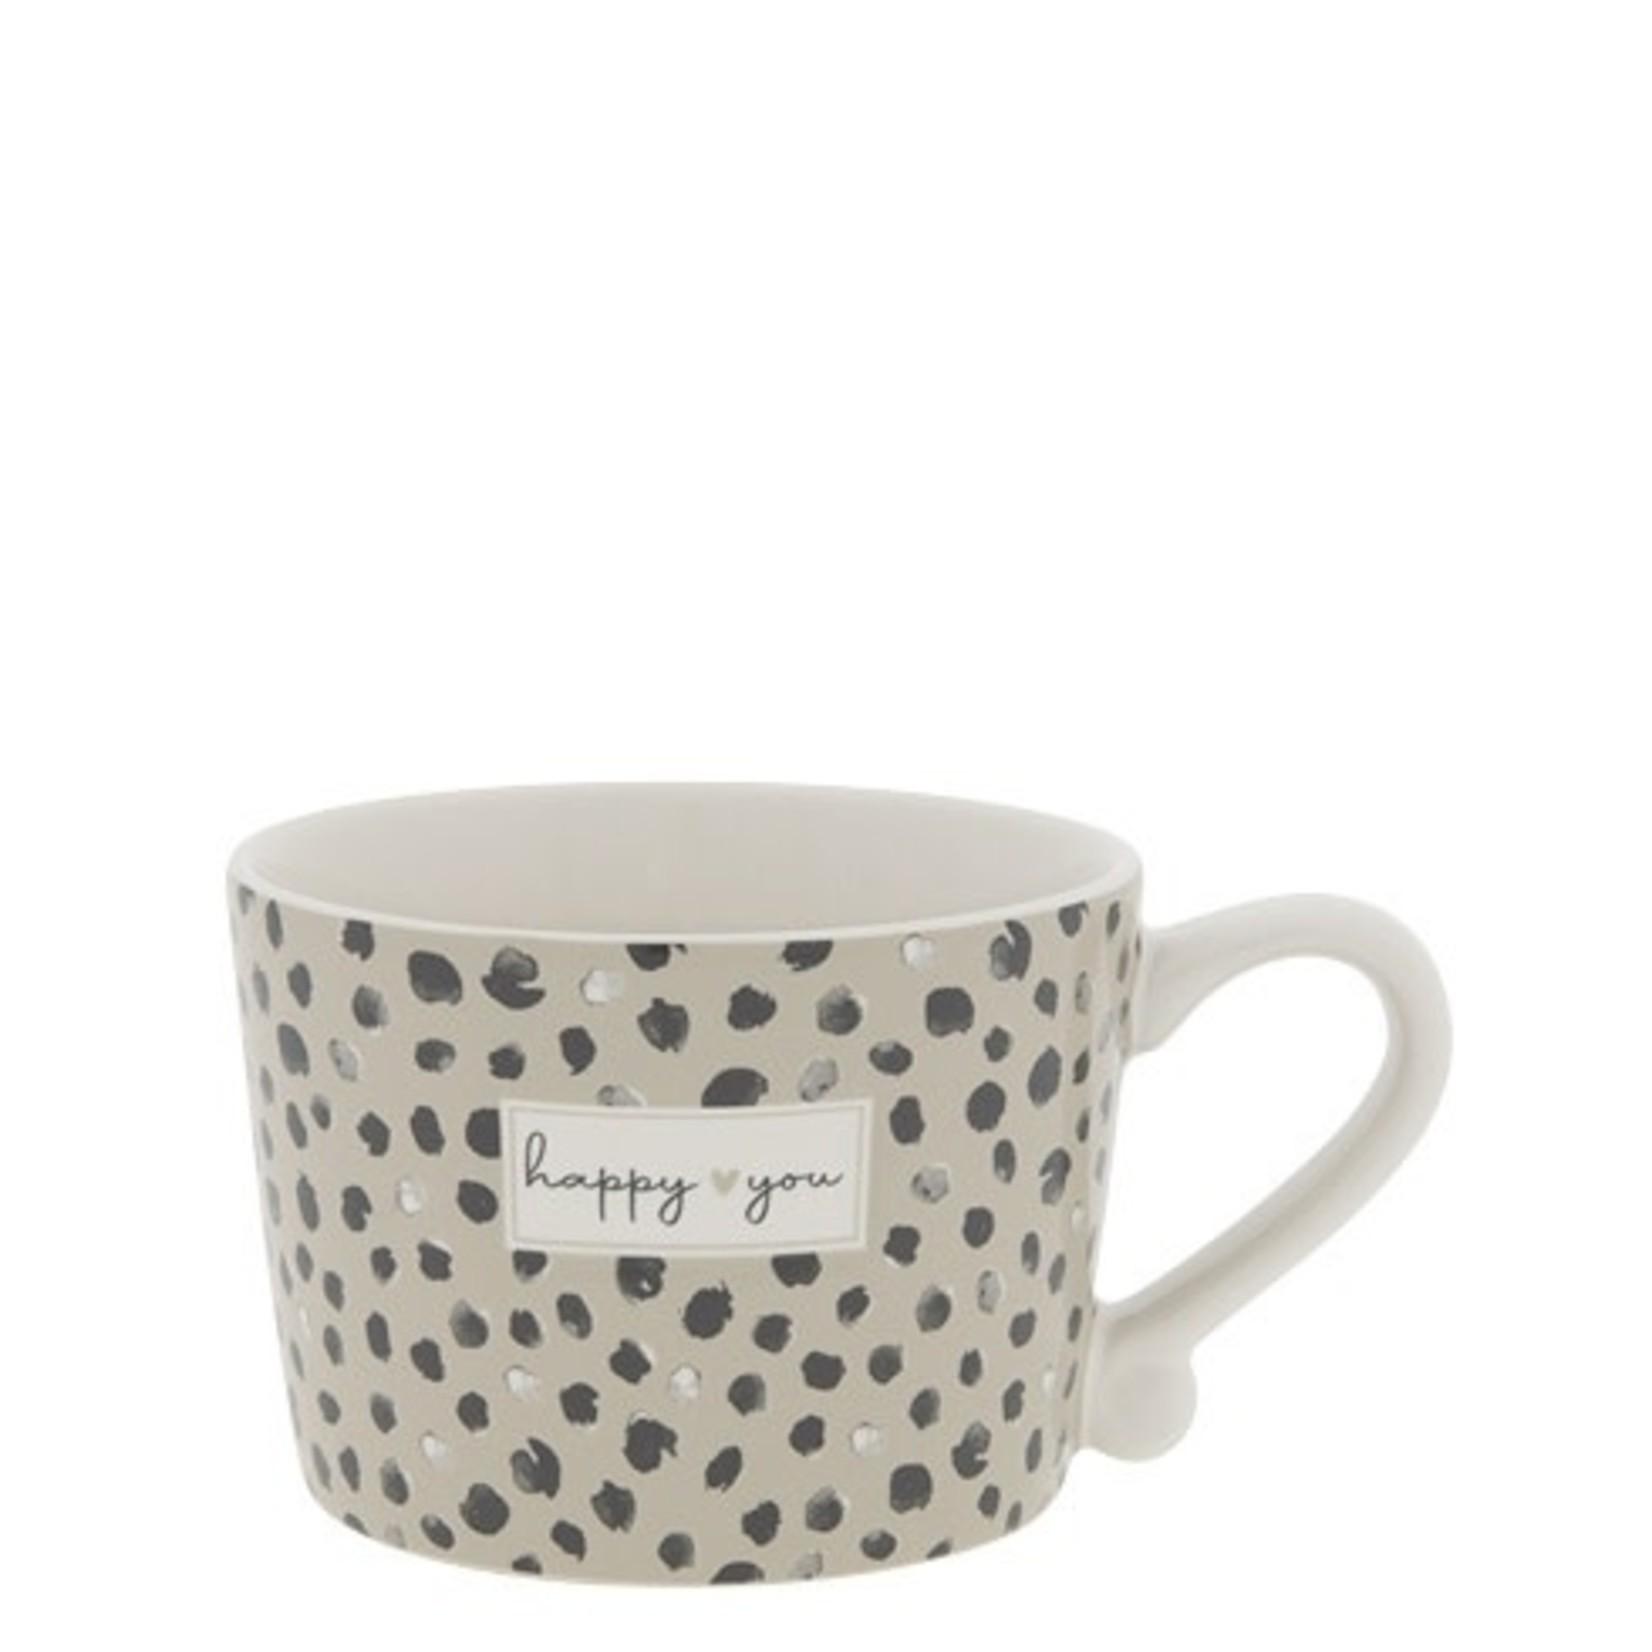 Bastion Collections Cup Confetti Happy You white/black/titane 8.5x7x6 cm